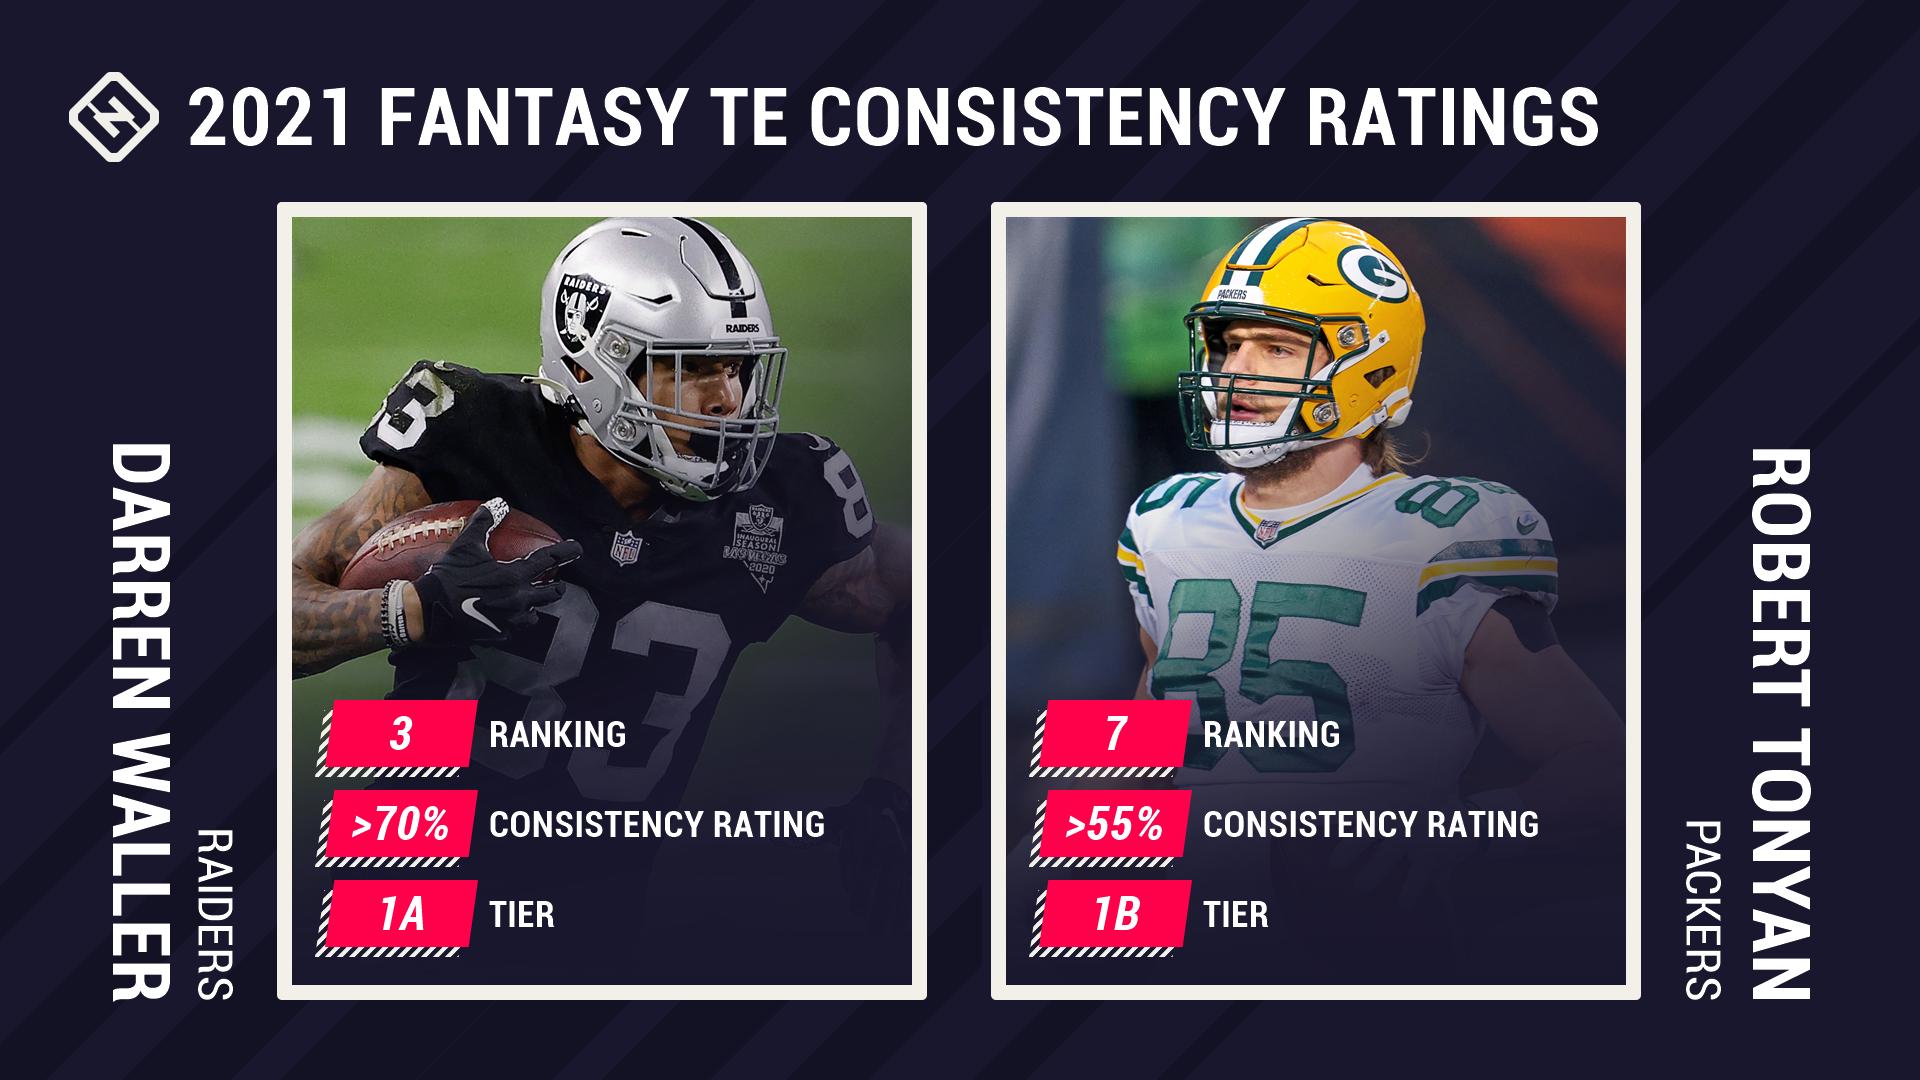 2021 fantasy consistency ratings te ftr 1bv0kd317sdz118atwaedf5tk5